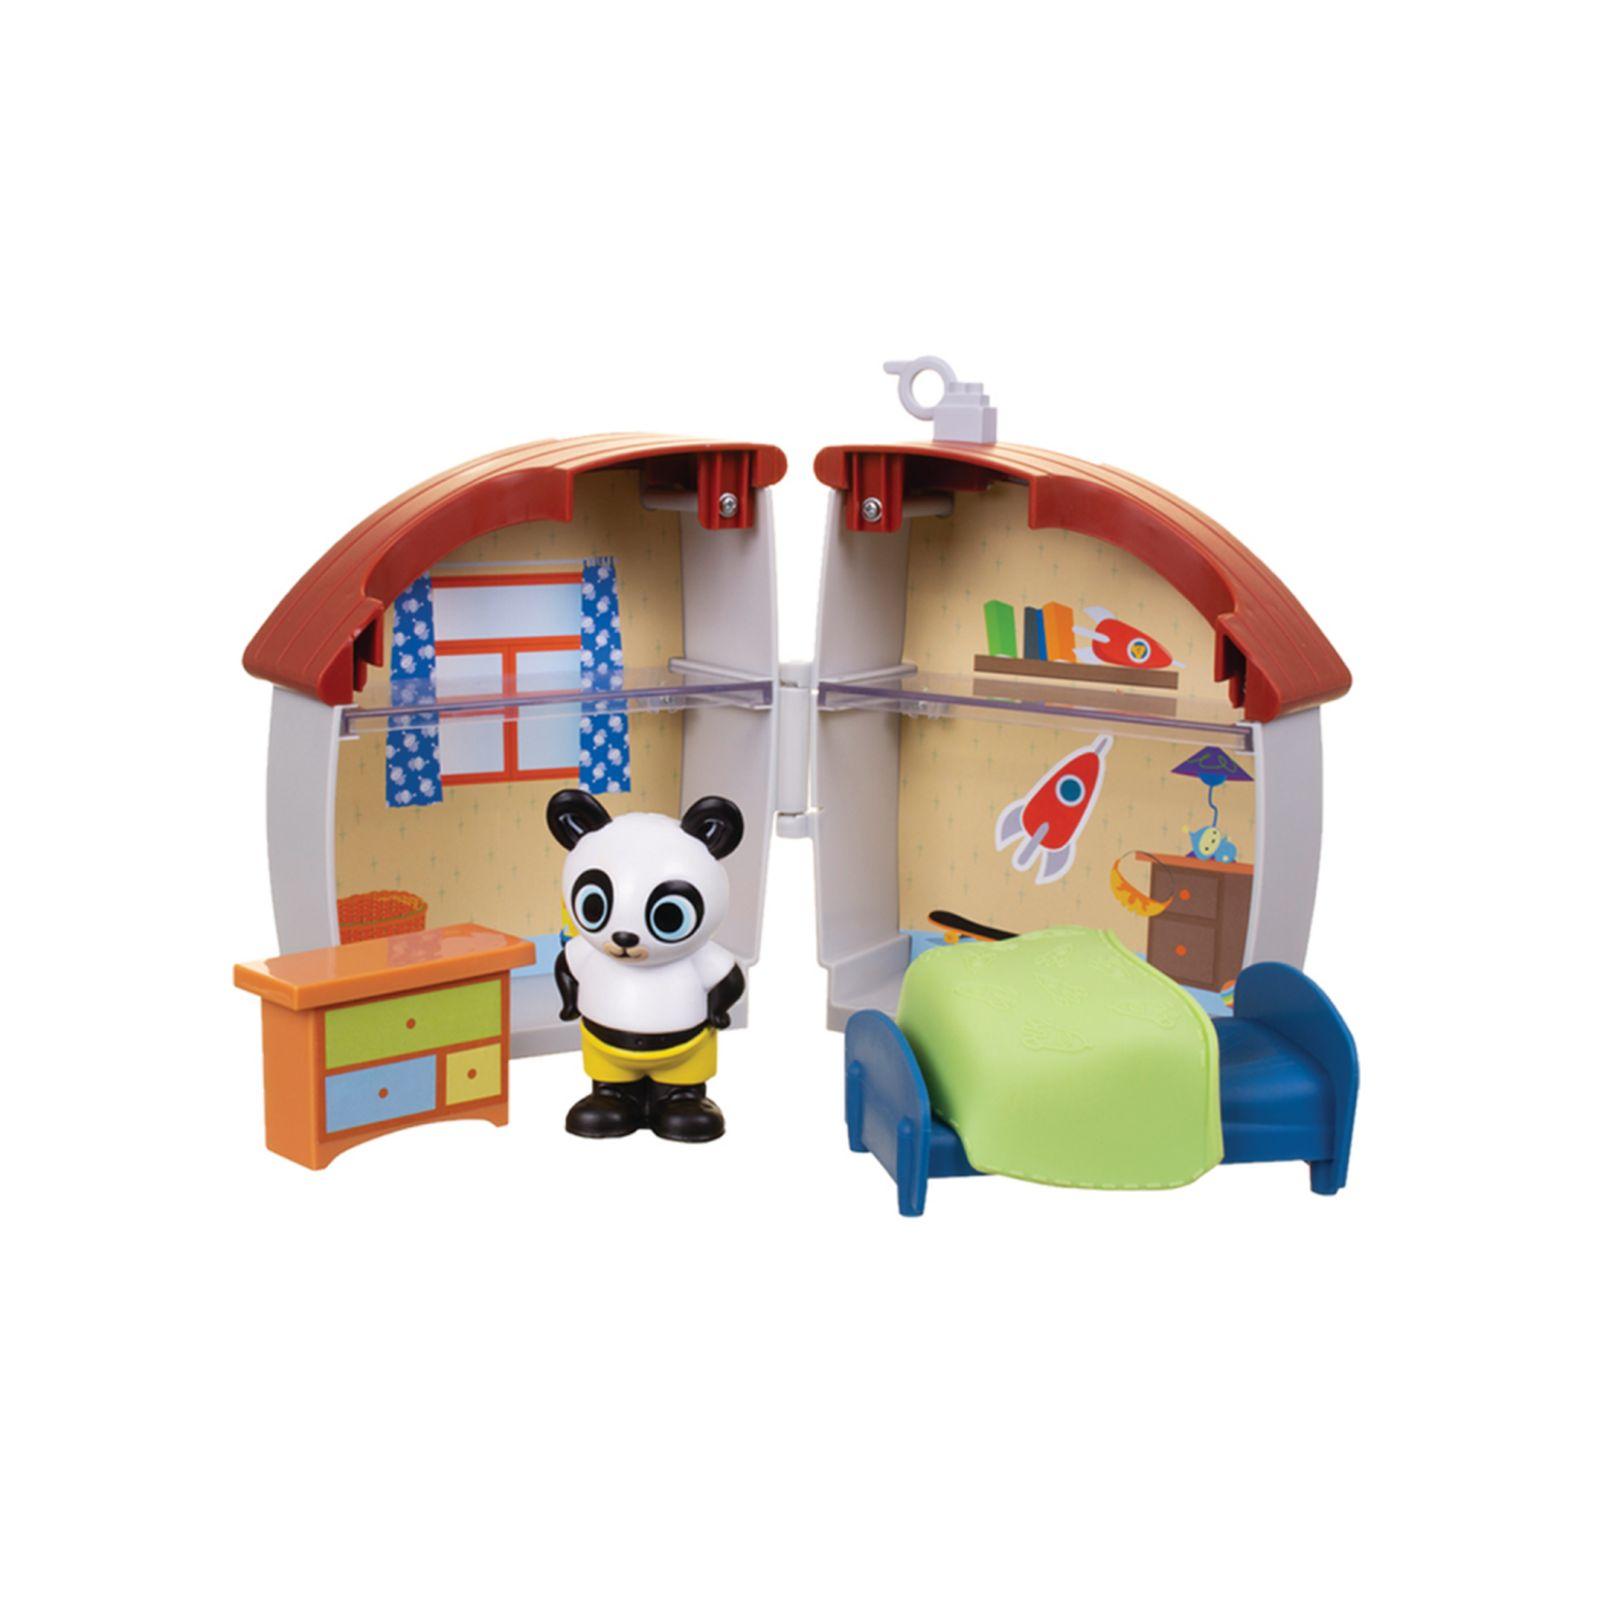 Bing playset minihouse pando - BING